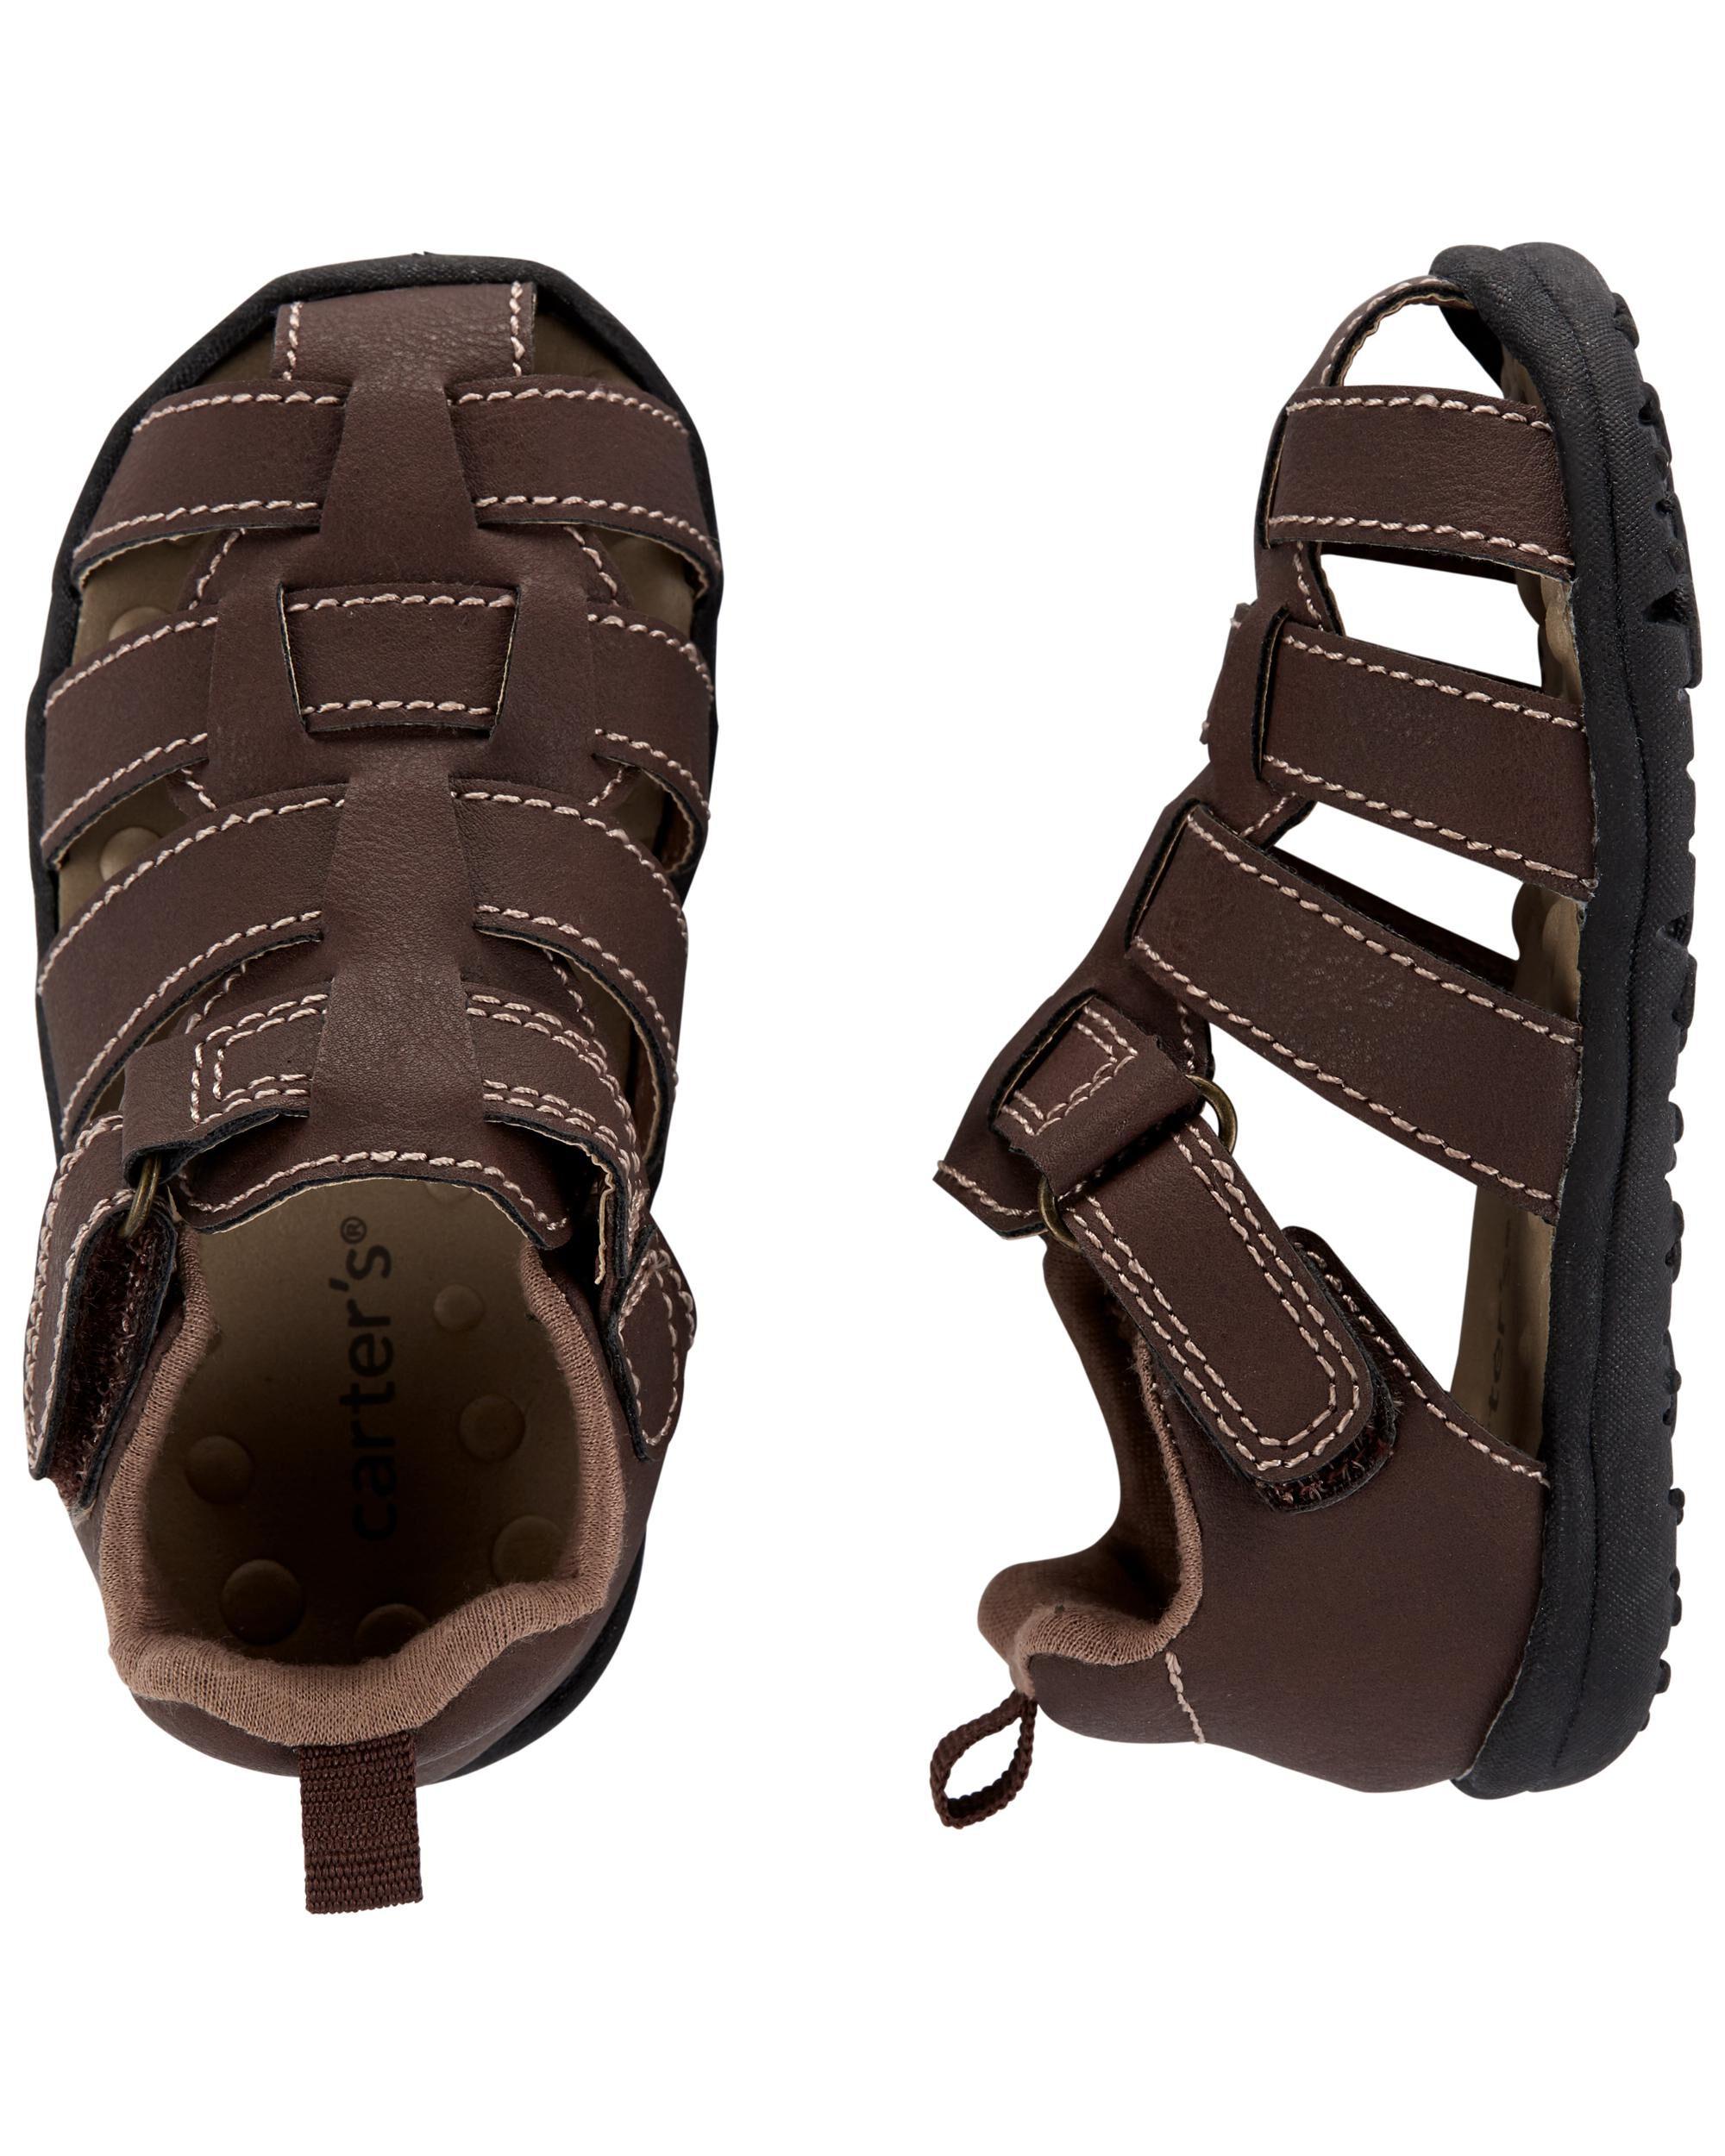 Oshkoshbgosh Carters Every Step Fisherman Sandals